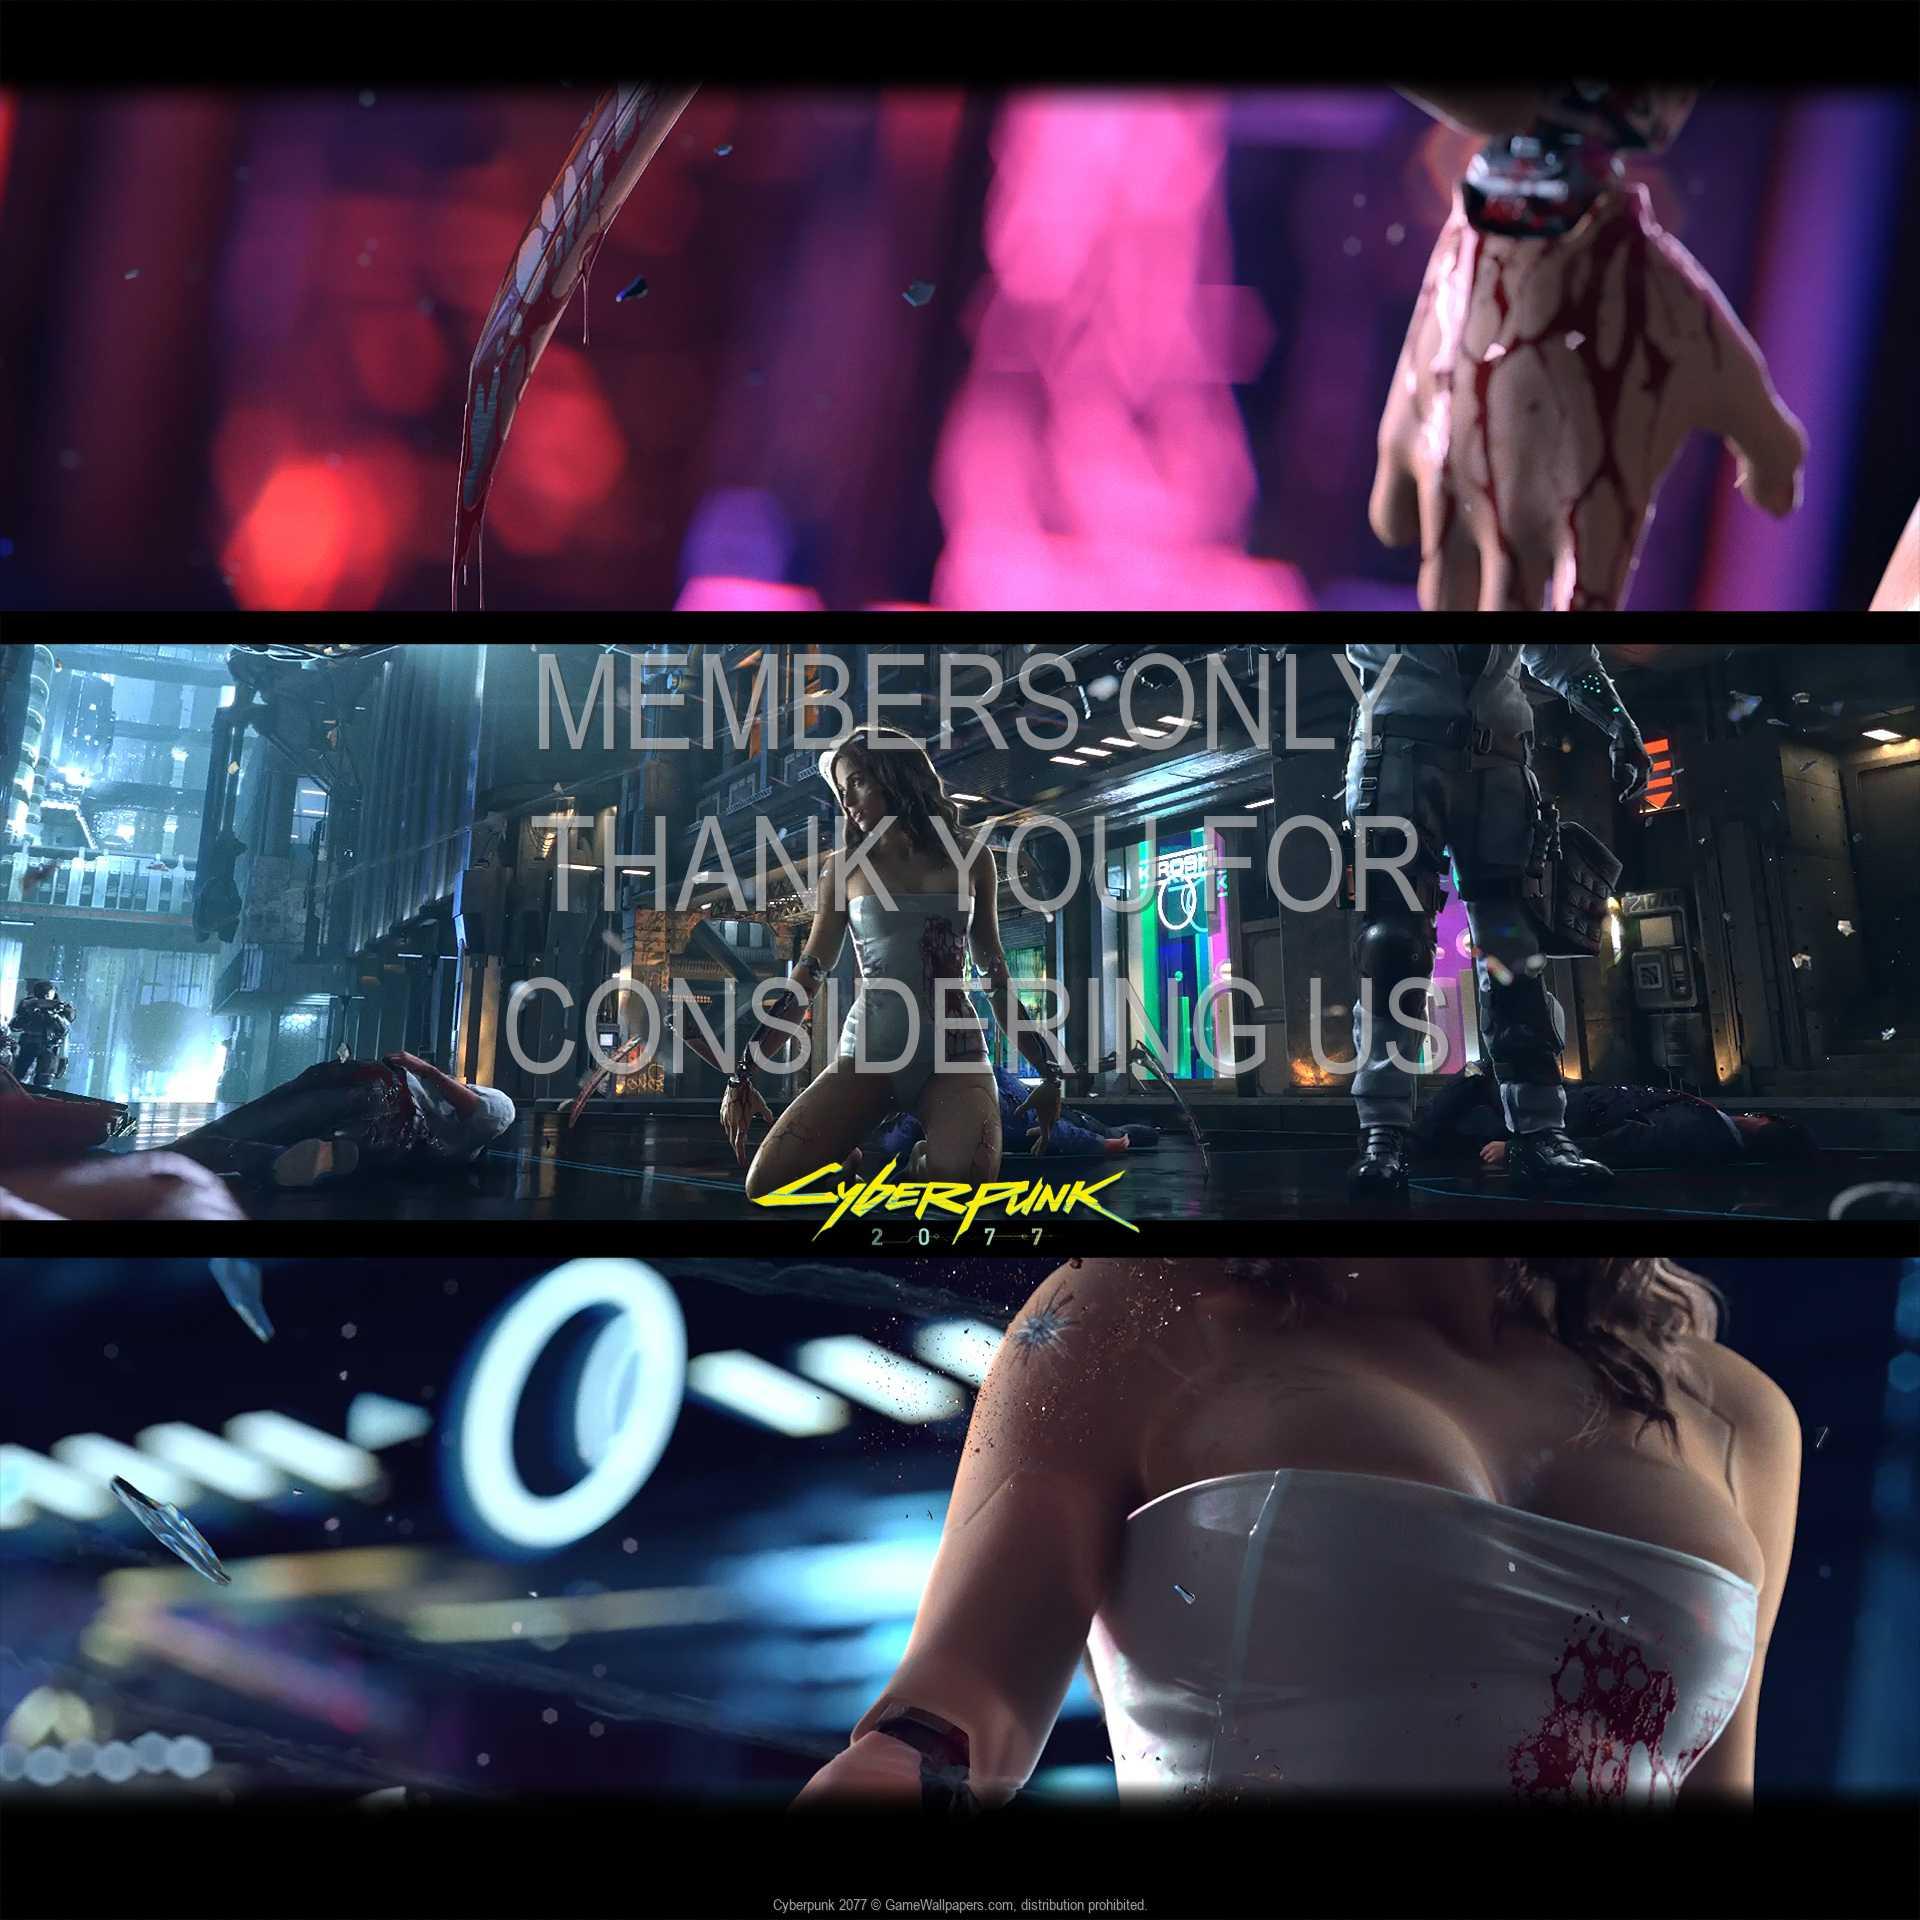 Cyberpunk 2077 1080p Horizontal Handy Hintergrundbild 02